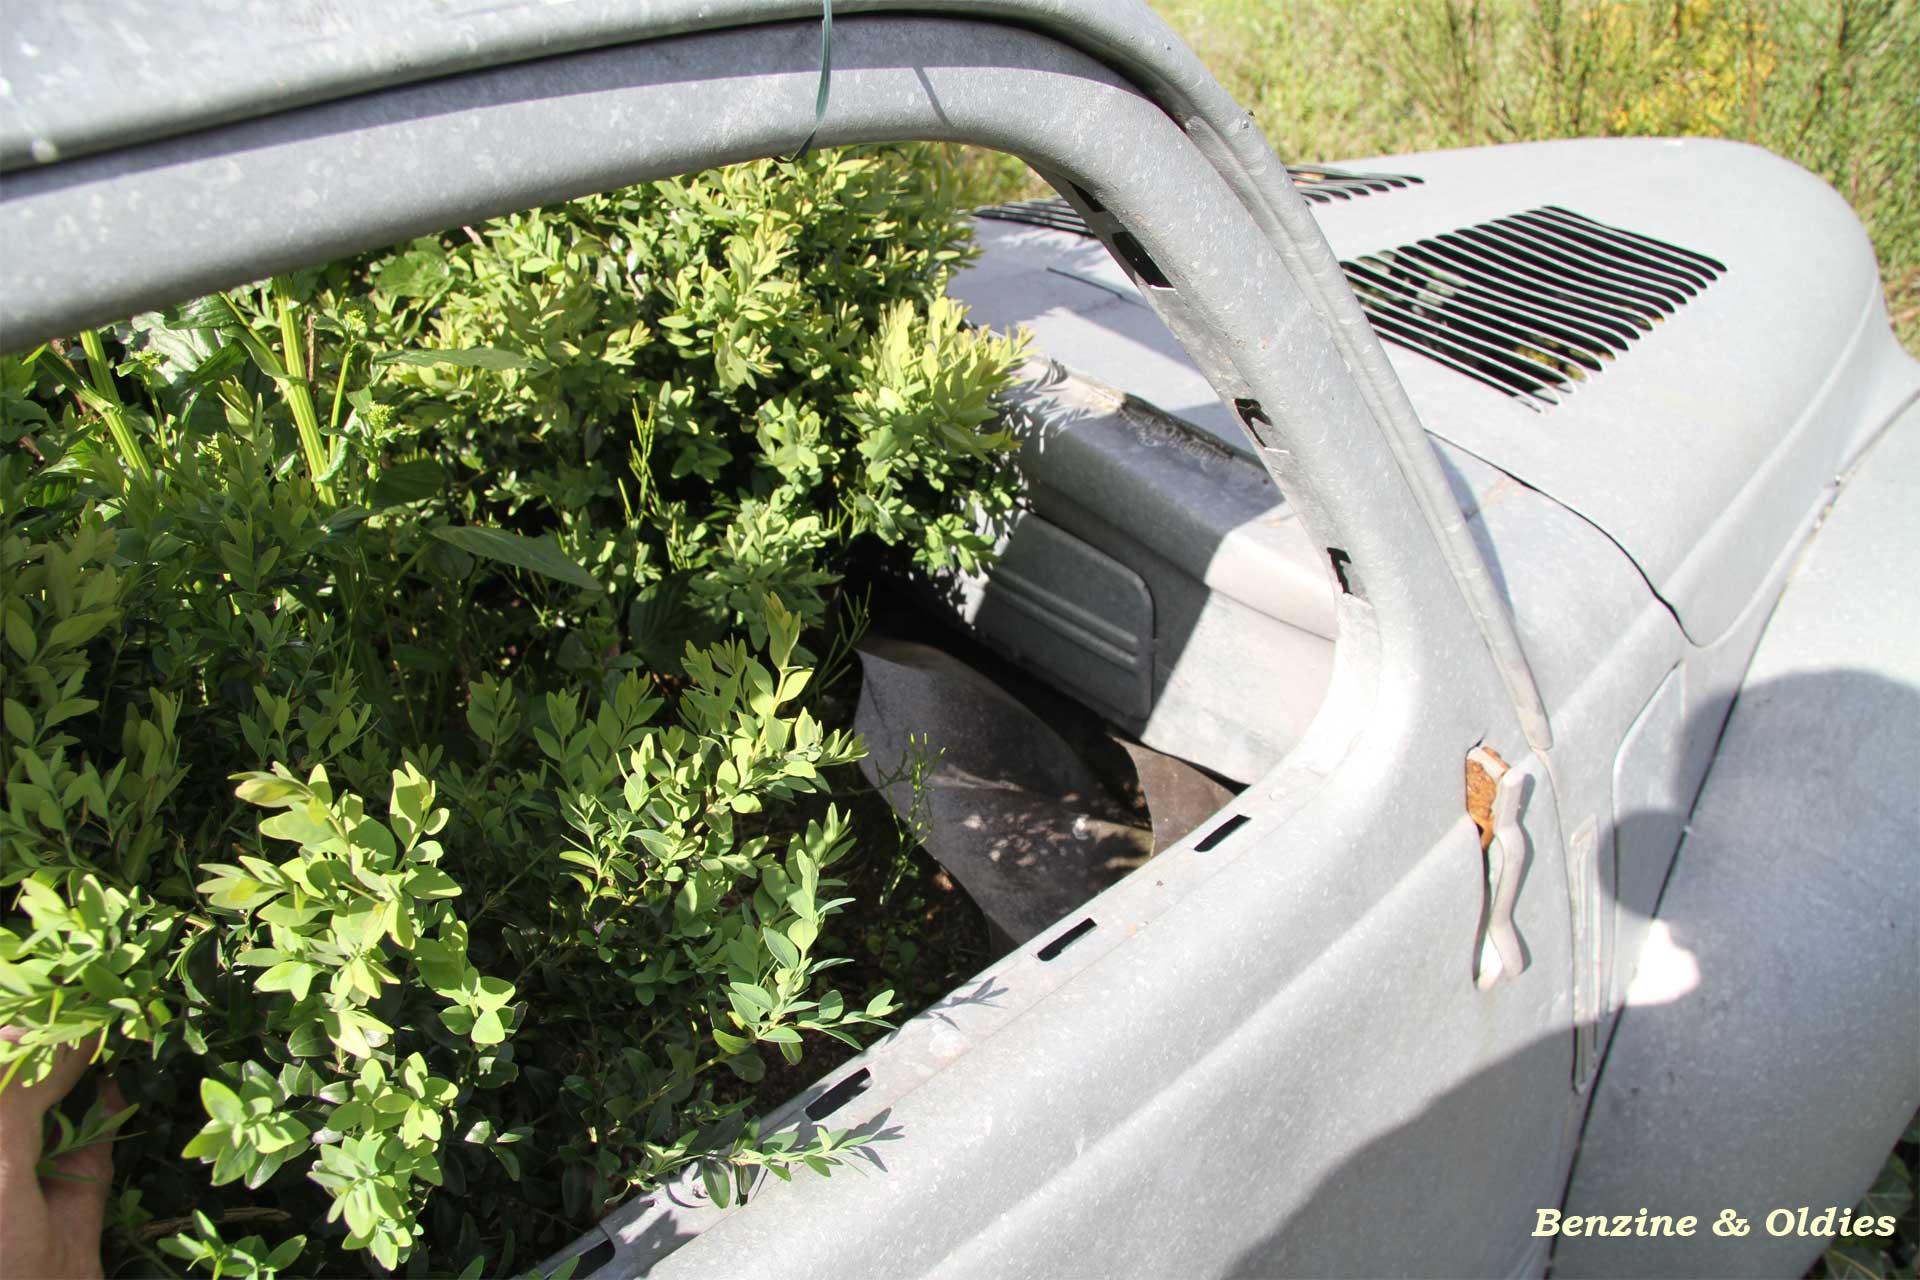 une Simca 6 carrosserie aluminium oubliée dans la nature - Simca6 - Page 2 419514simca6street35w19201280